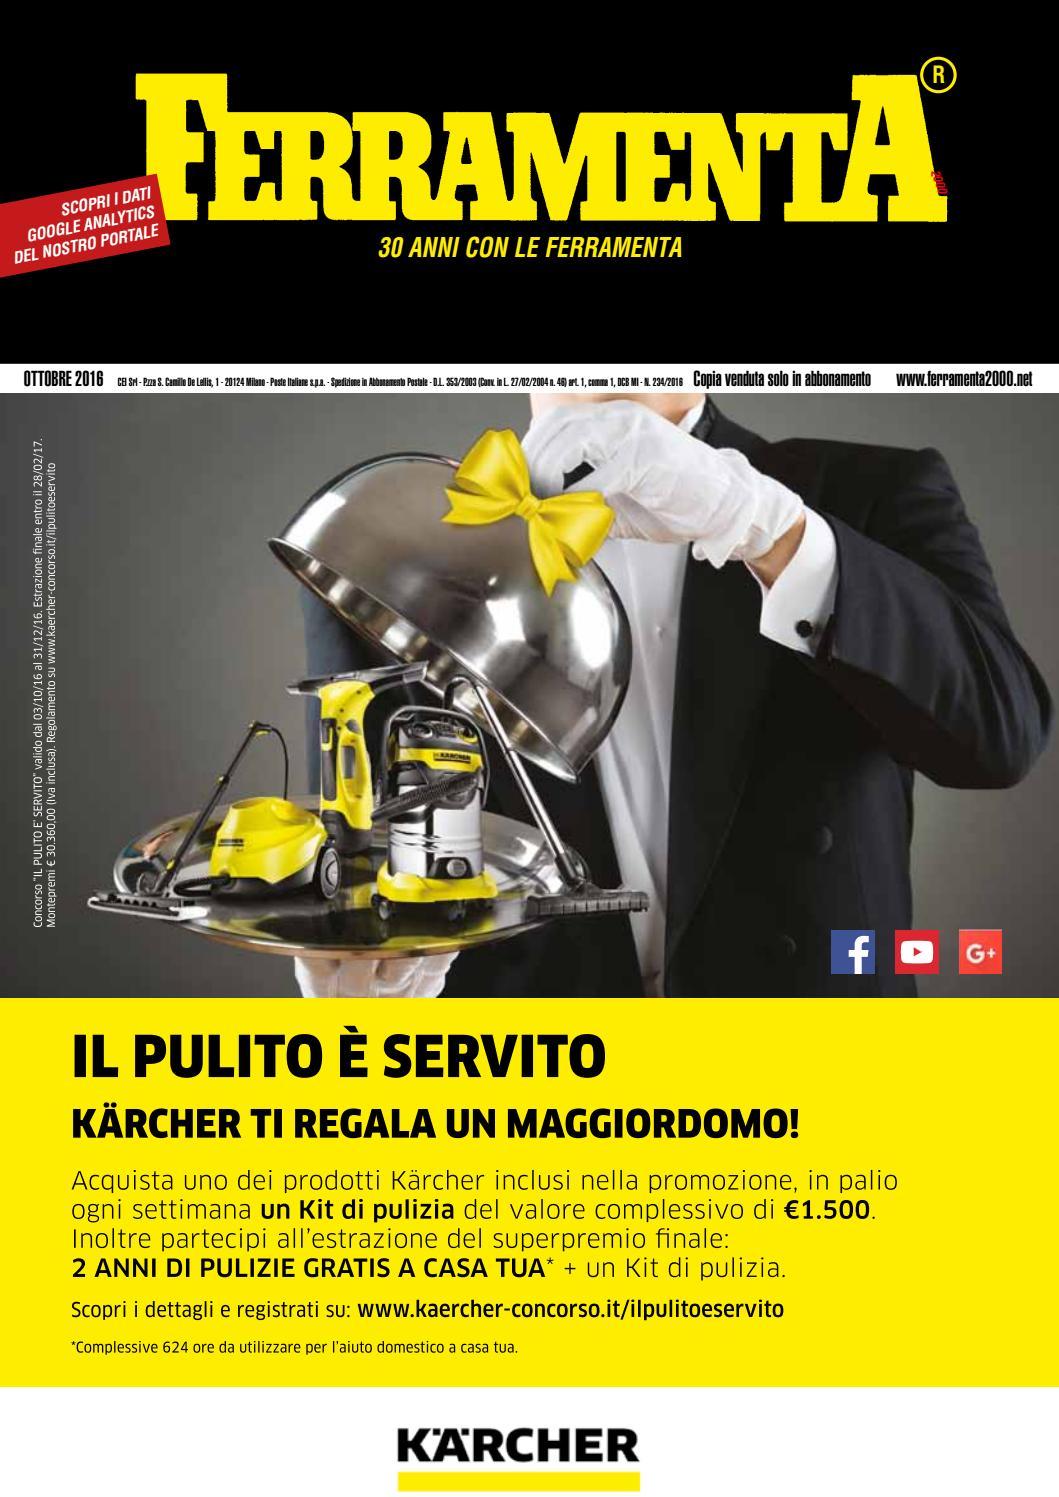 Ferramenta 2000 Ottobre by E.T. Edizioni Tecniche SRL - issuu 11eff4beceeb